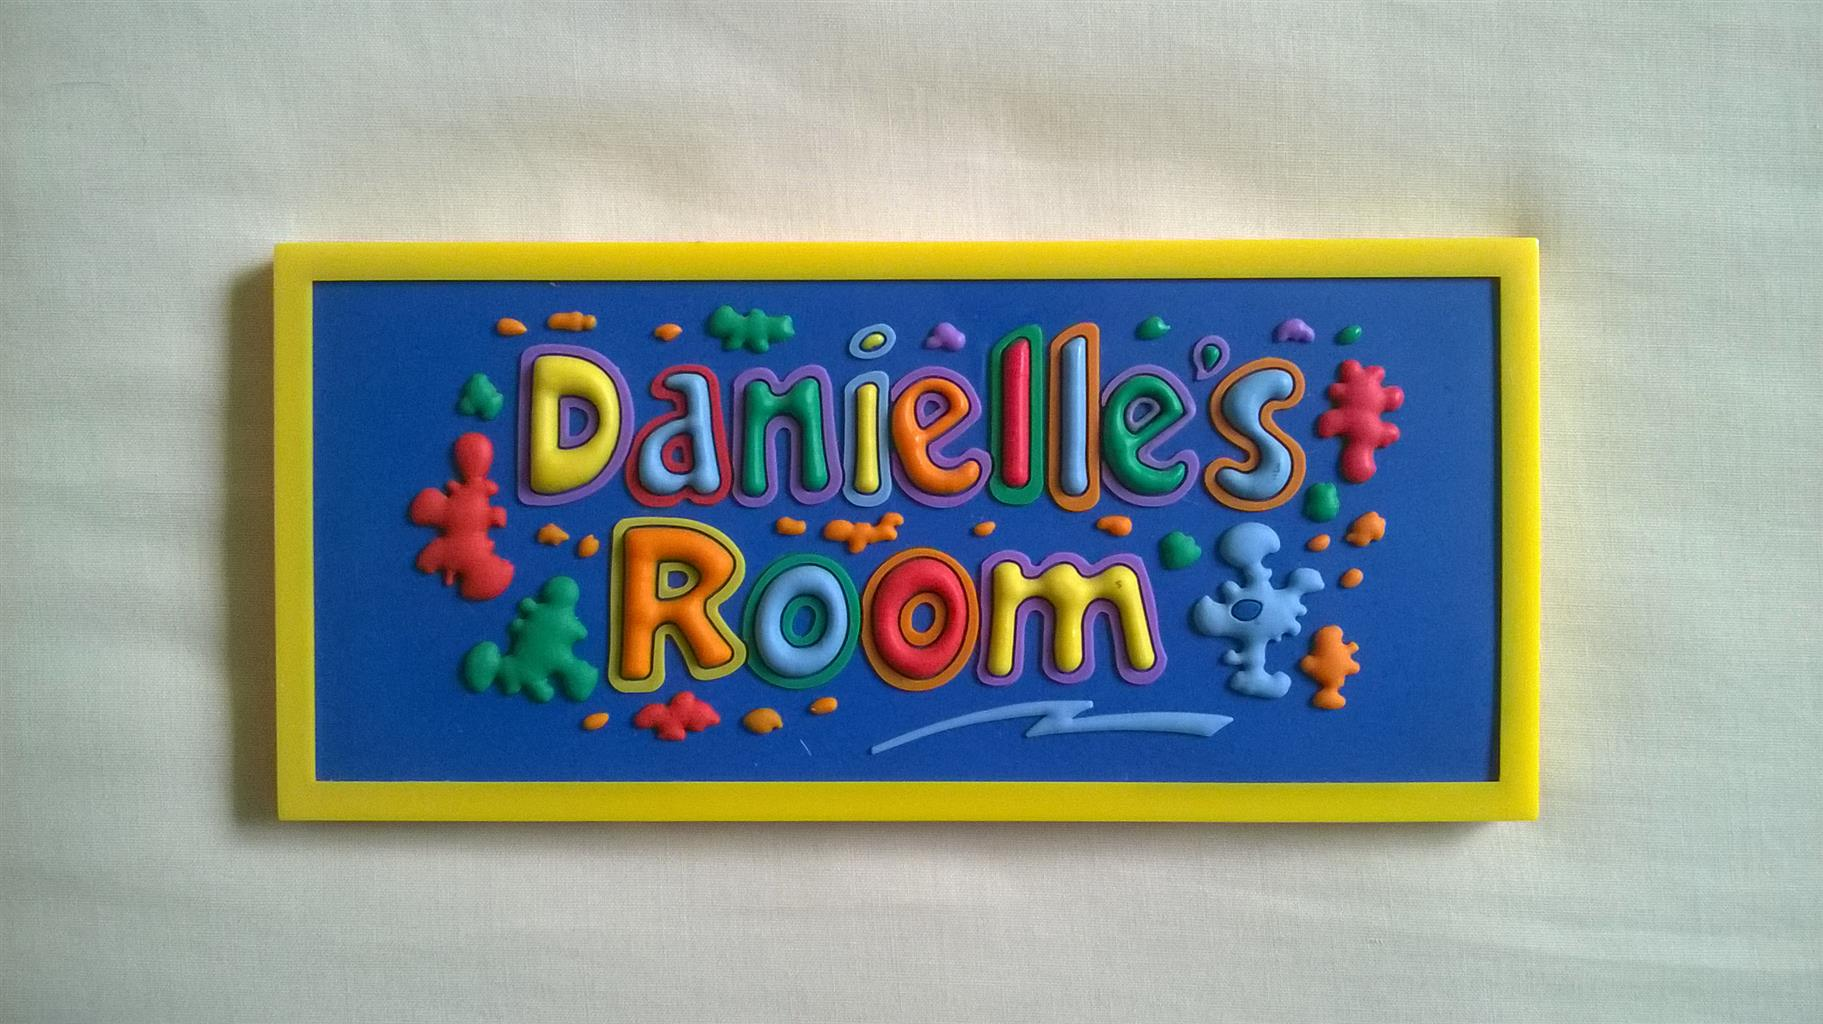 Danielle nameplate